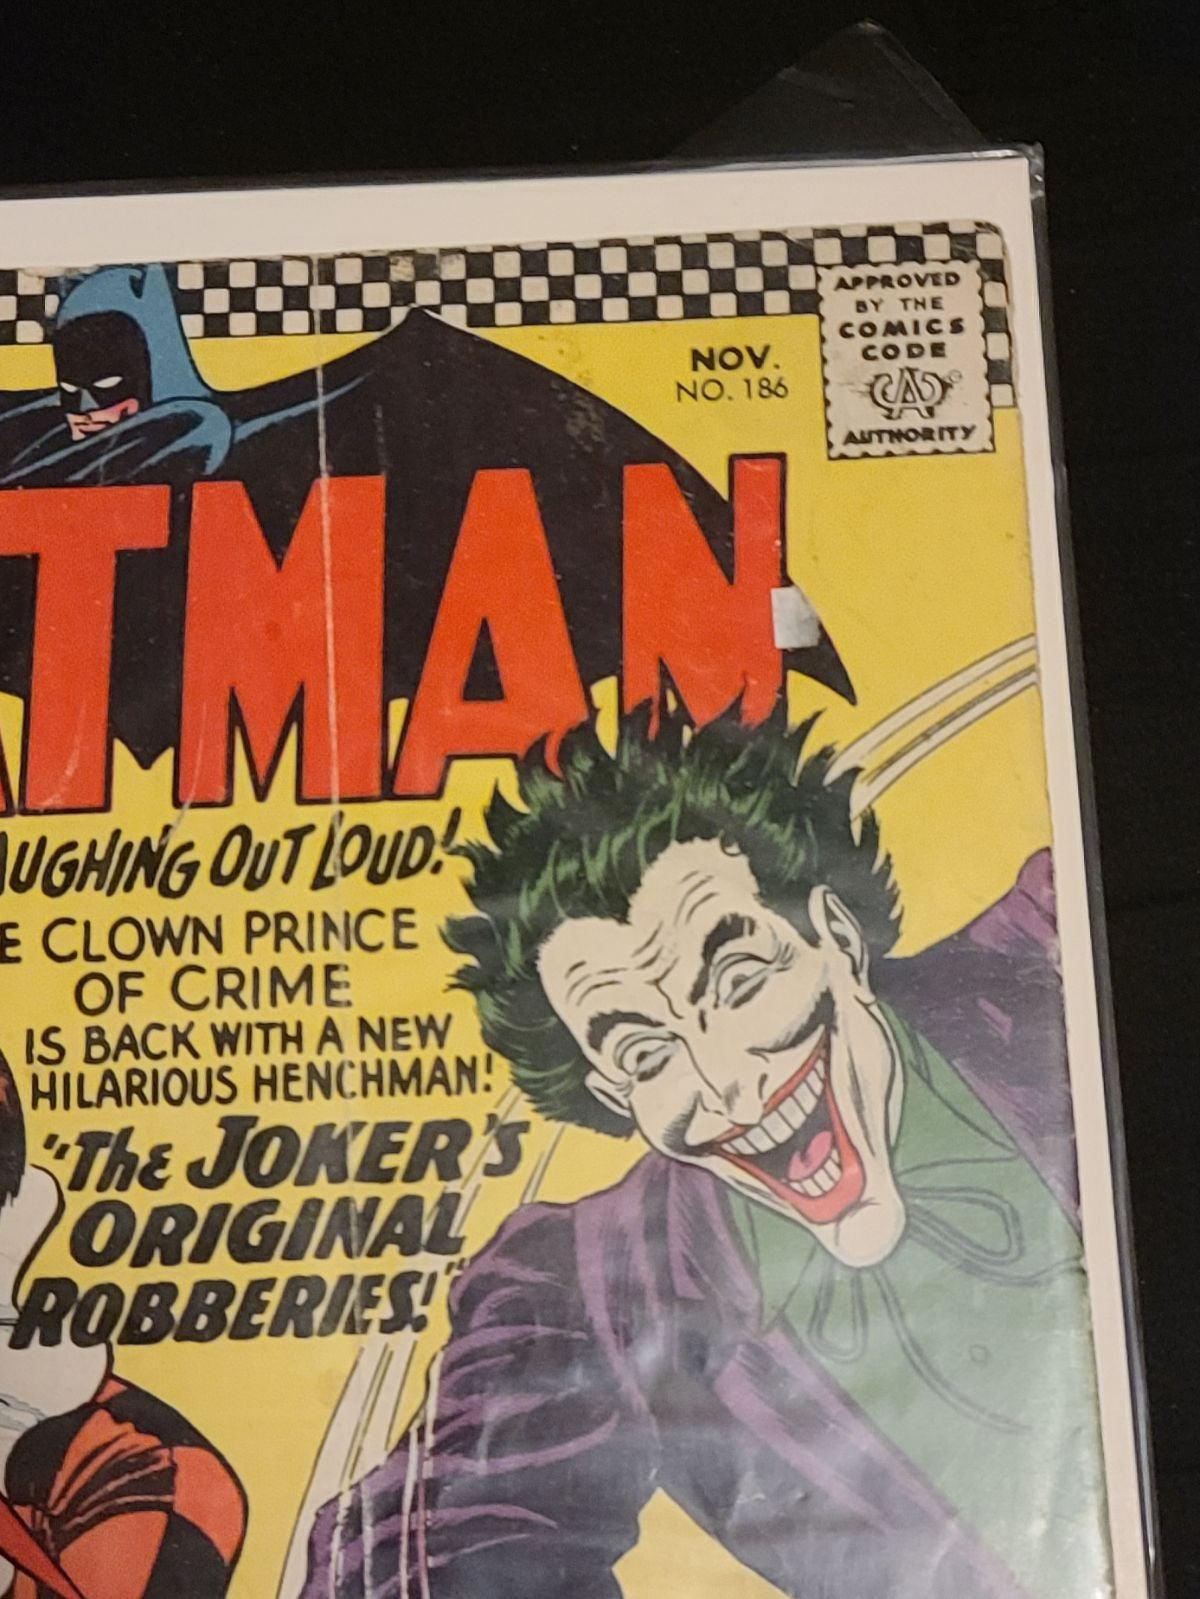 Batman issue #186